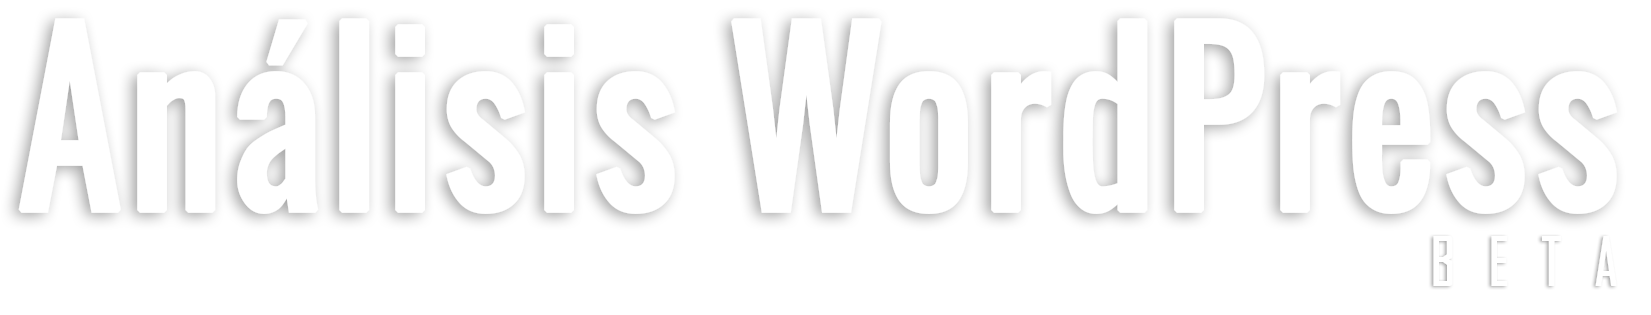 Análisis WordPress